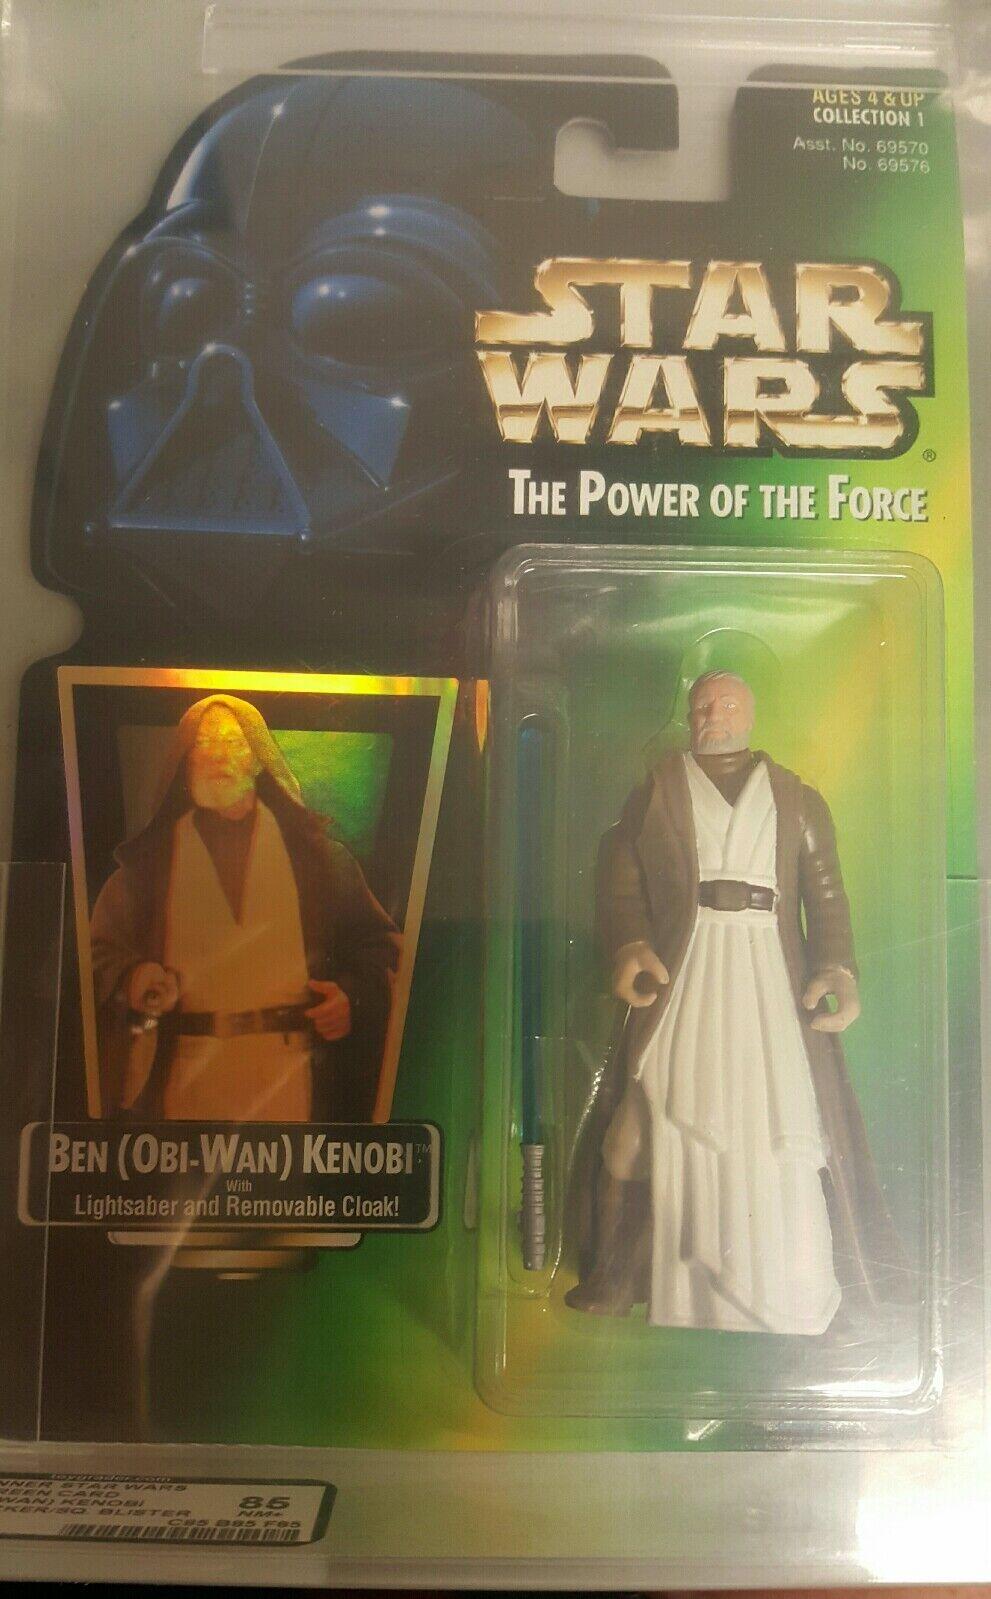 1997 Kenner Star Wars POTF2 vert voitured  AFA Graded Ben (Obi-Wan) Kenobi 85NM+  pour votre style de jeu aux meilleurs prix